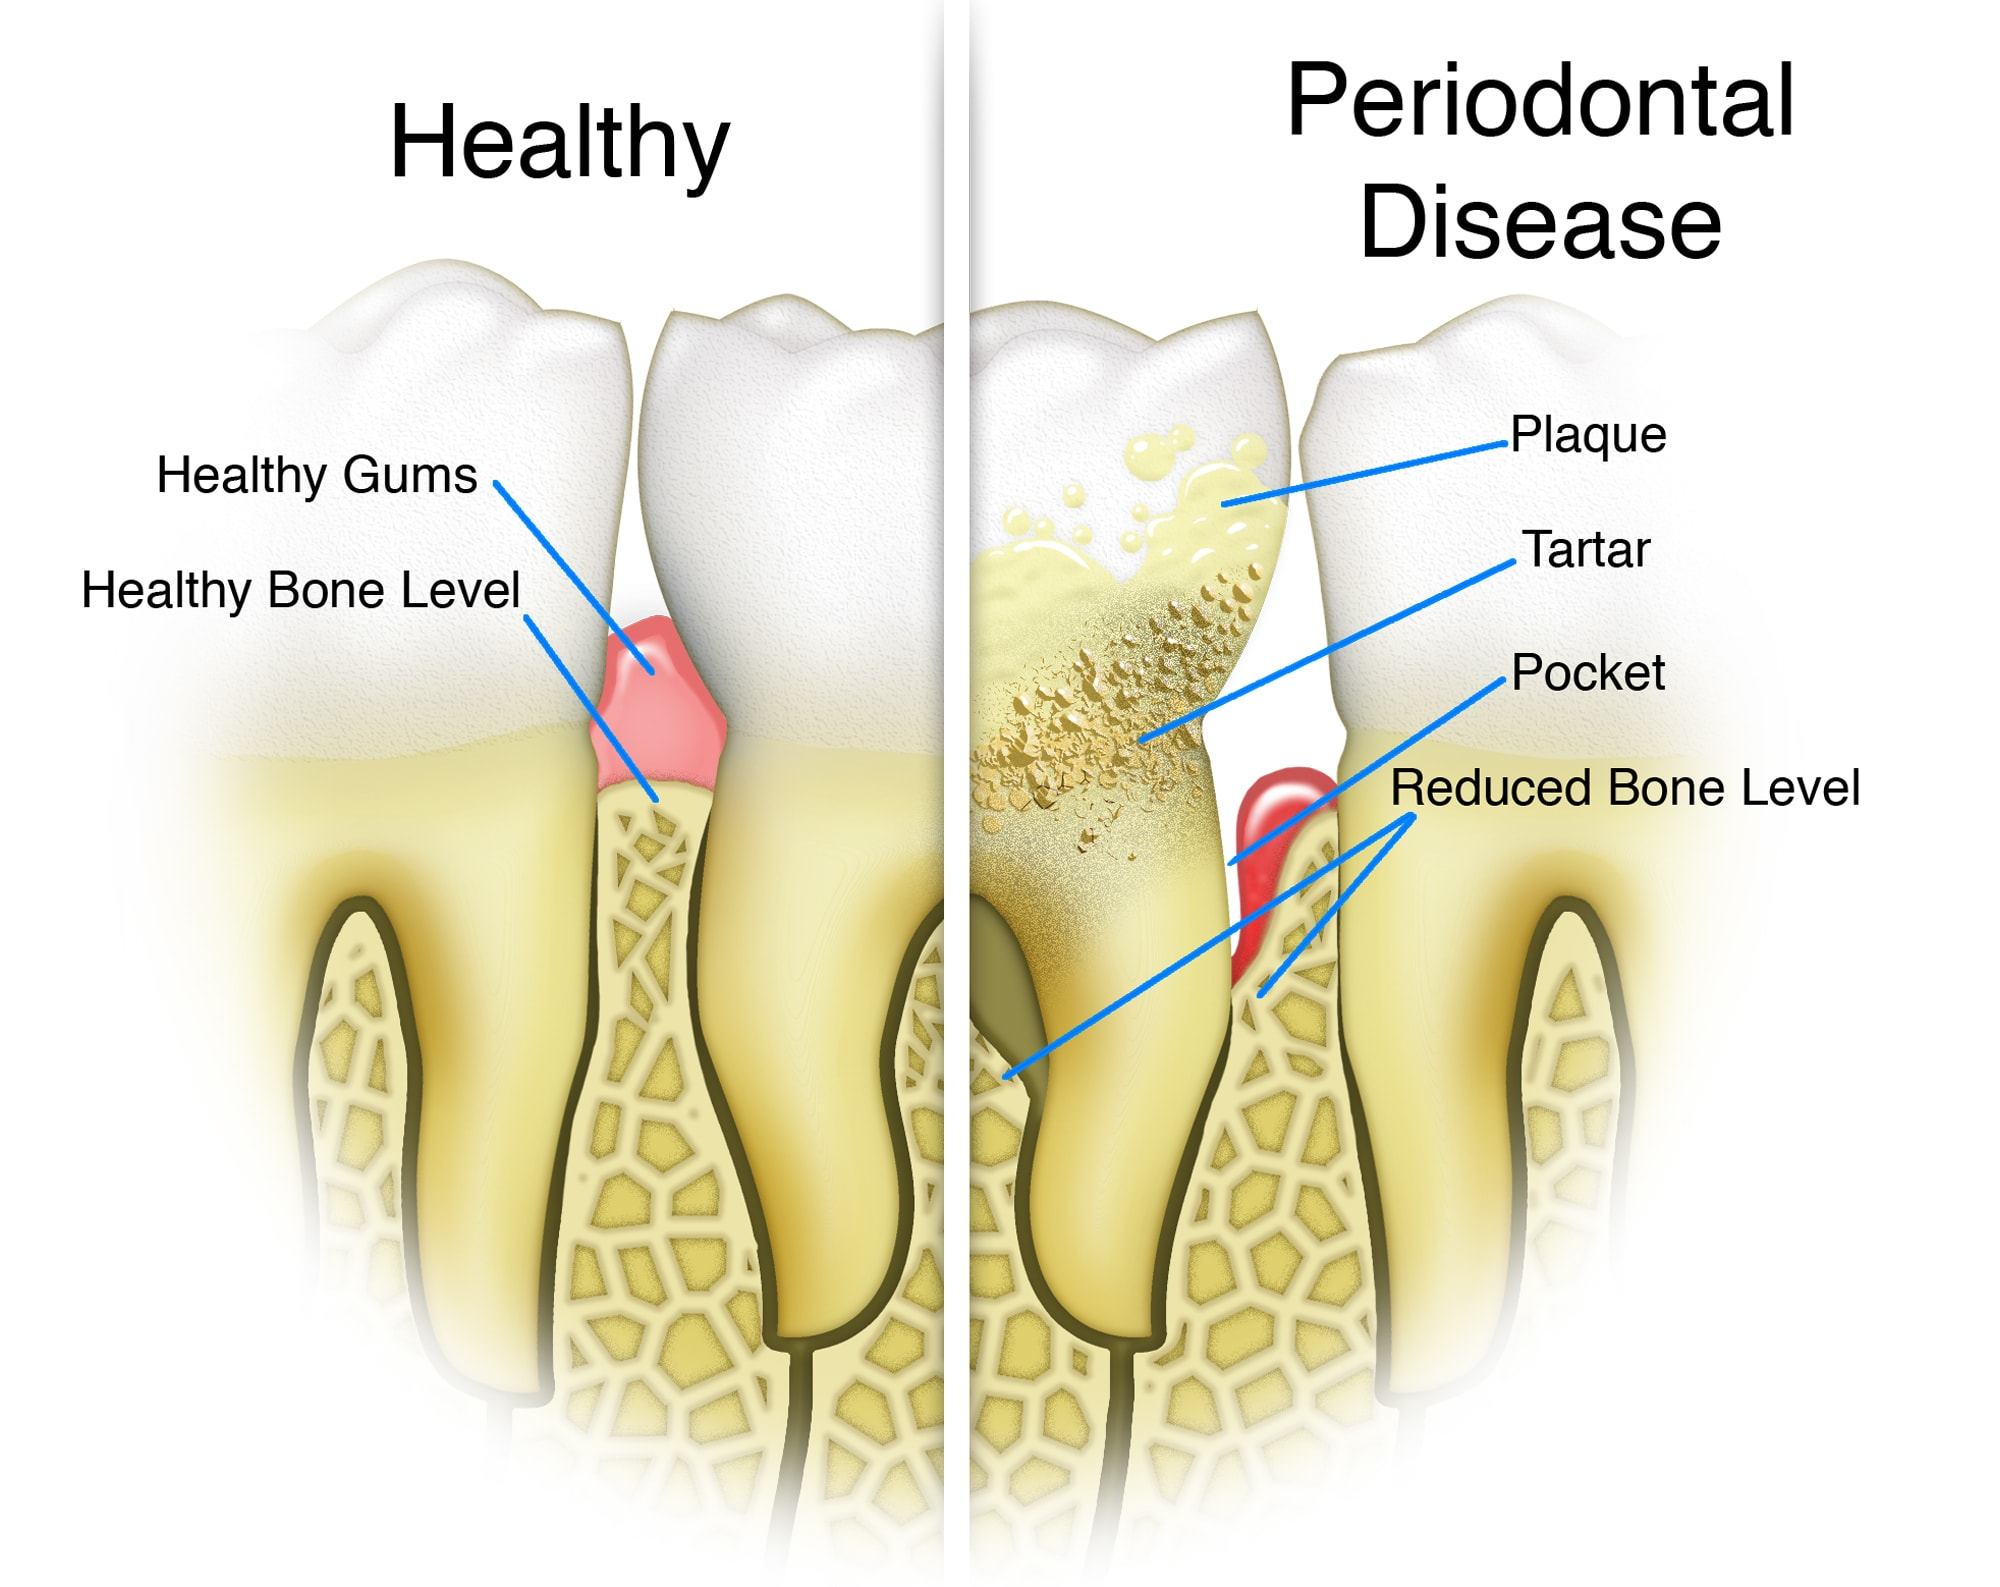 periodontal disease diagram thackeray mansfield